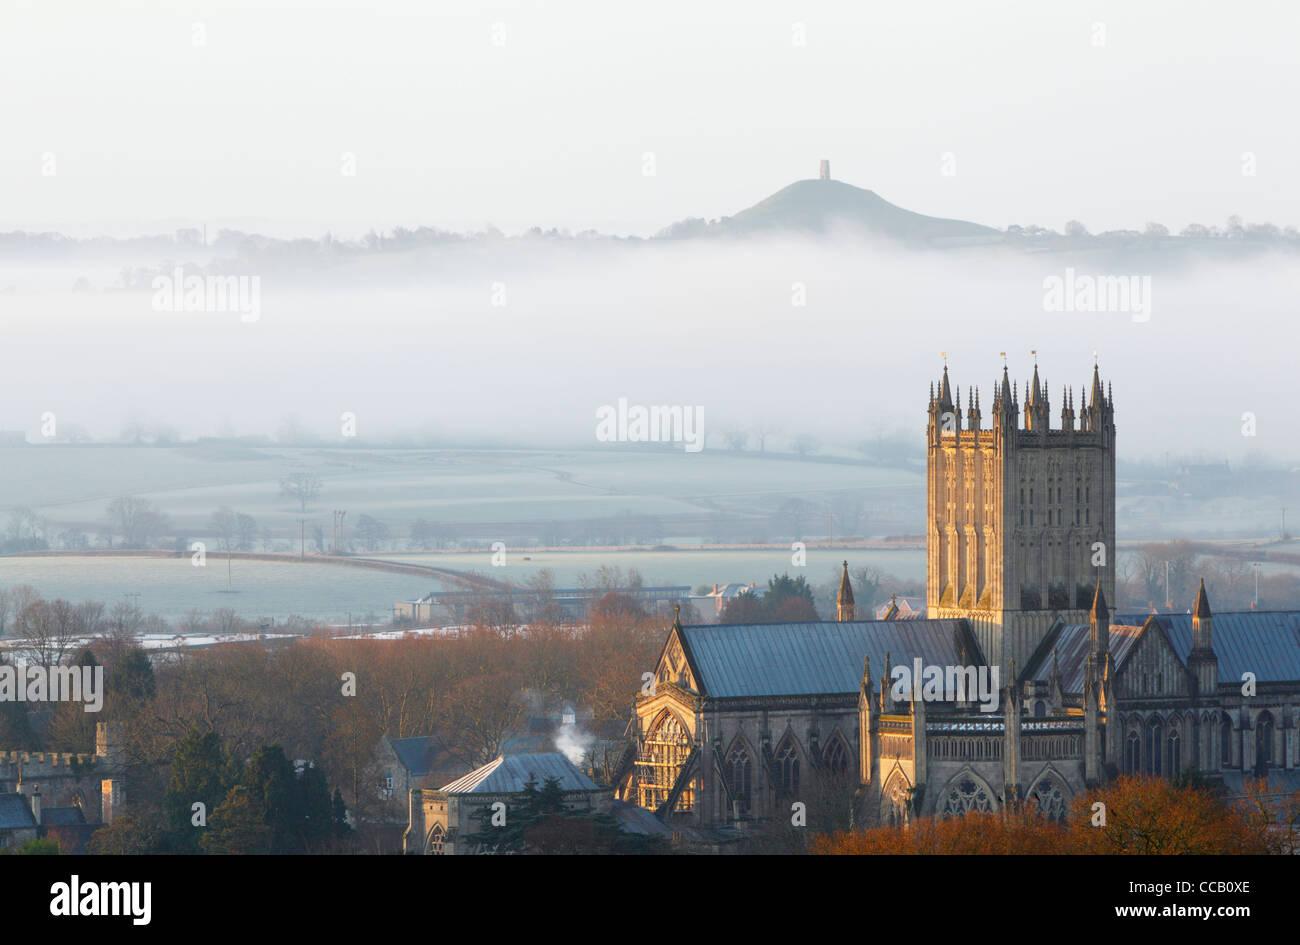 Wells Cathedral avec Tor de Glastonbury au loin. L'hiver. Le Somerset. L'Angleterre. UK. Banque D'Images